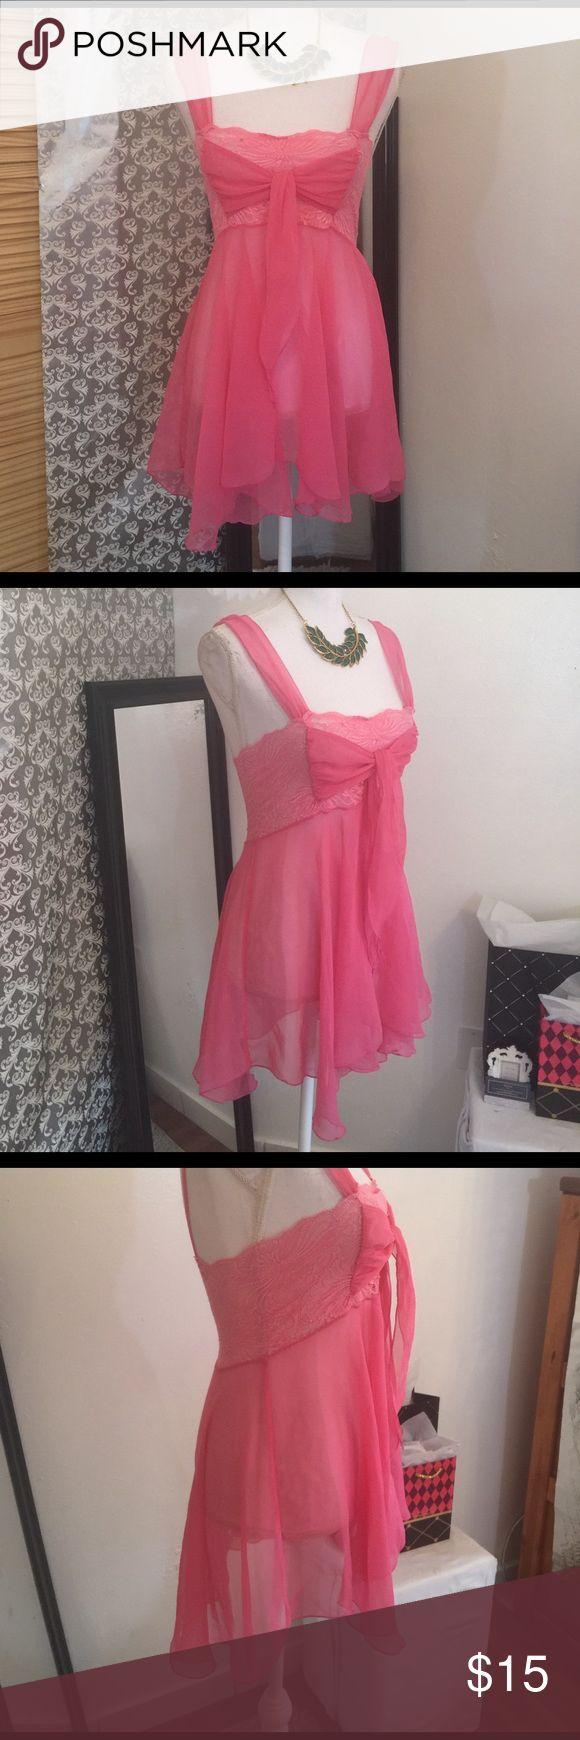 Victoria's Secret pink lingerie Size p Victoria's Secret Intimates & Sleepwear